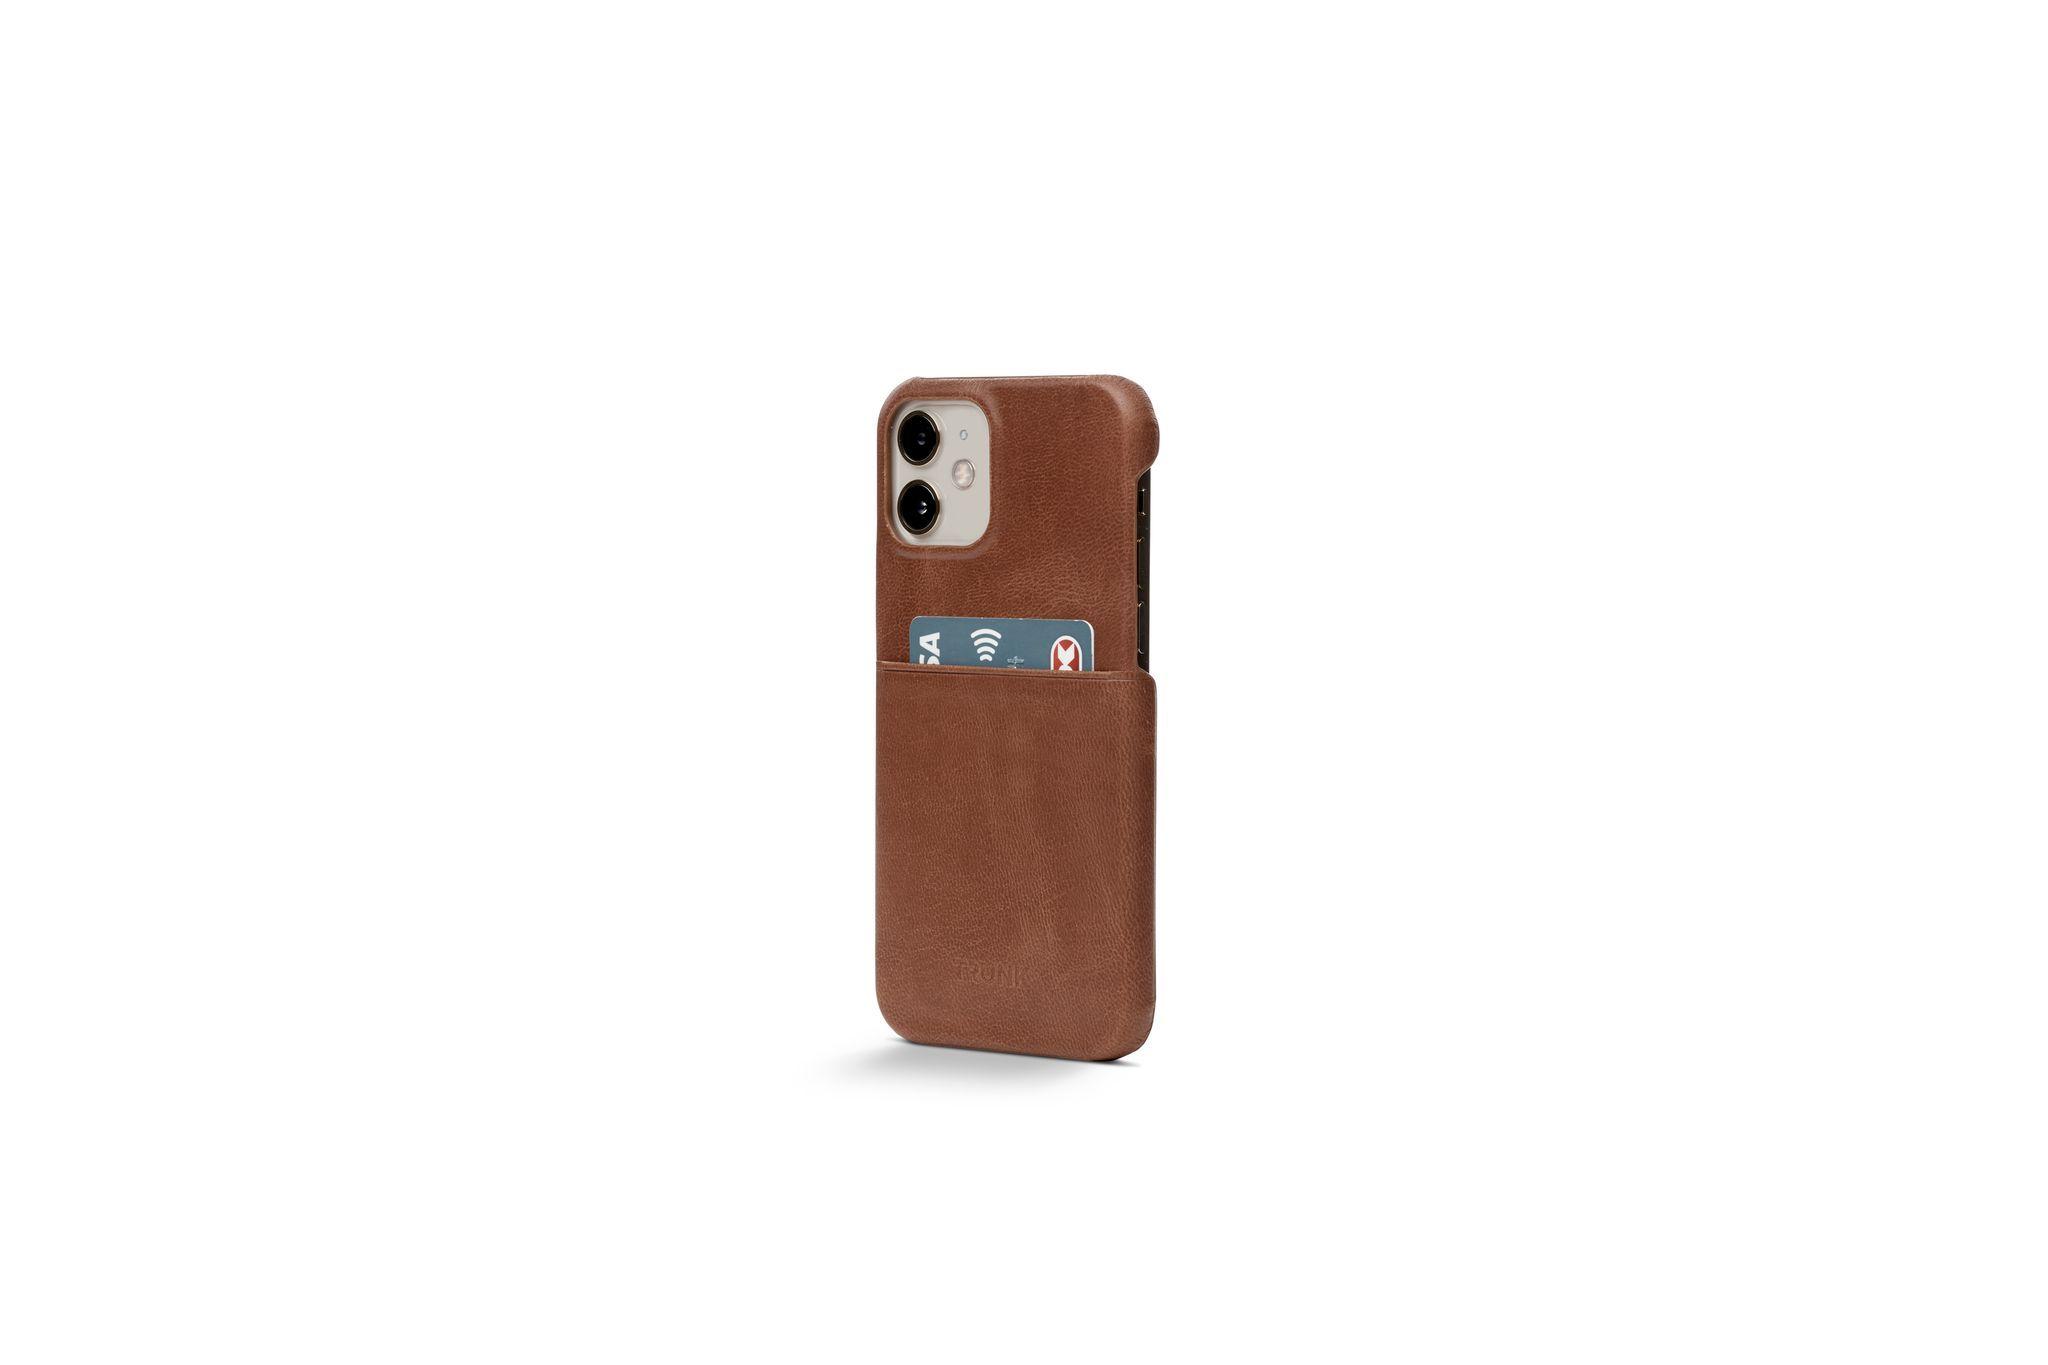 Trunk Leather Back Cover (iPhone 12 mini) - Brun